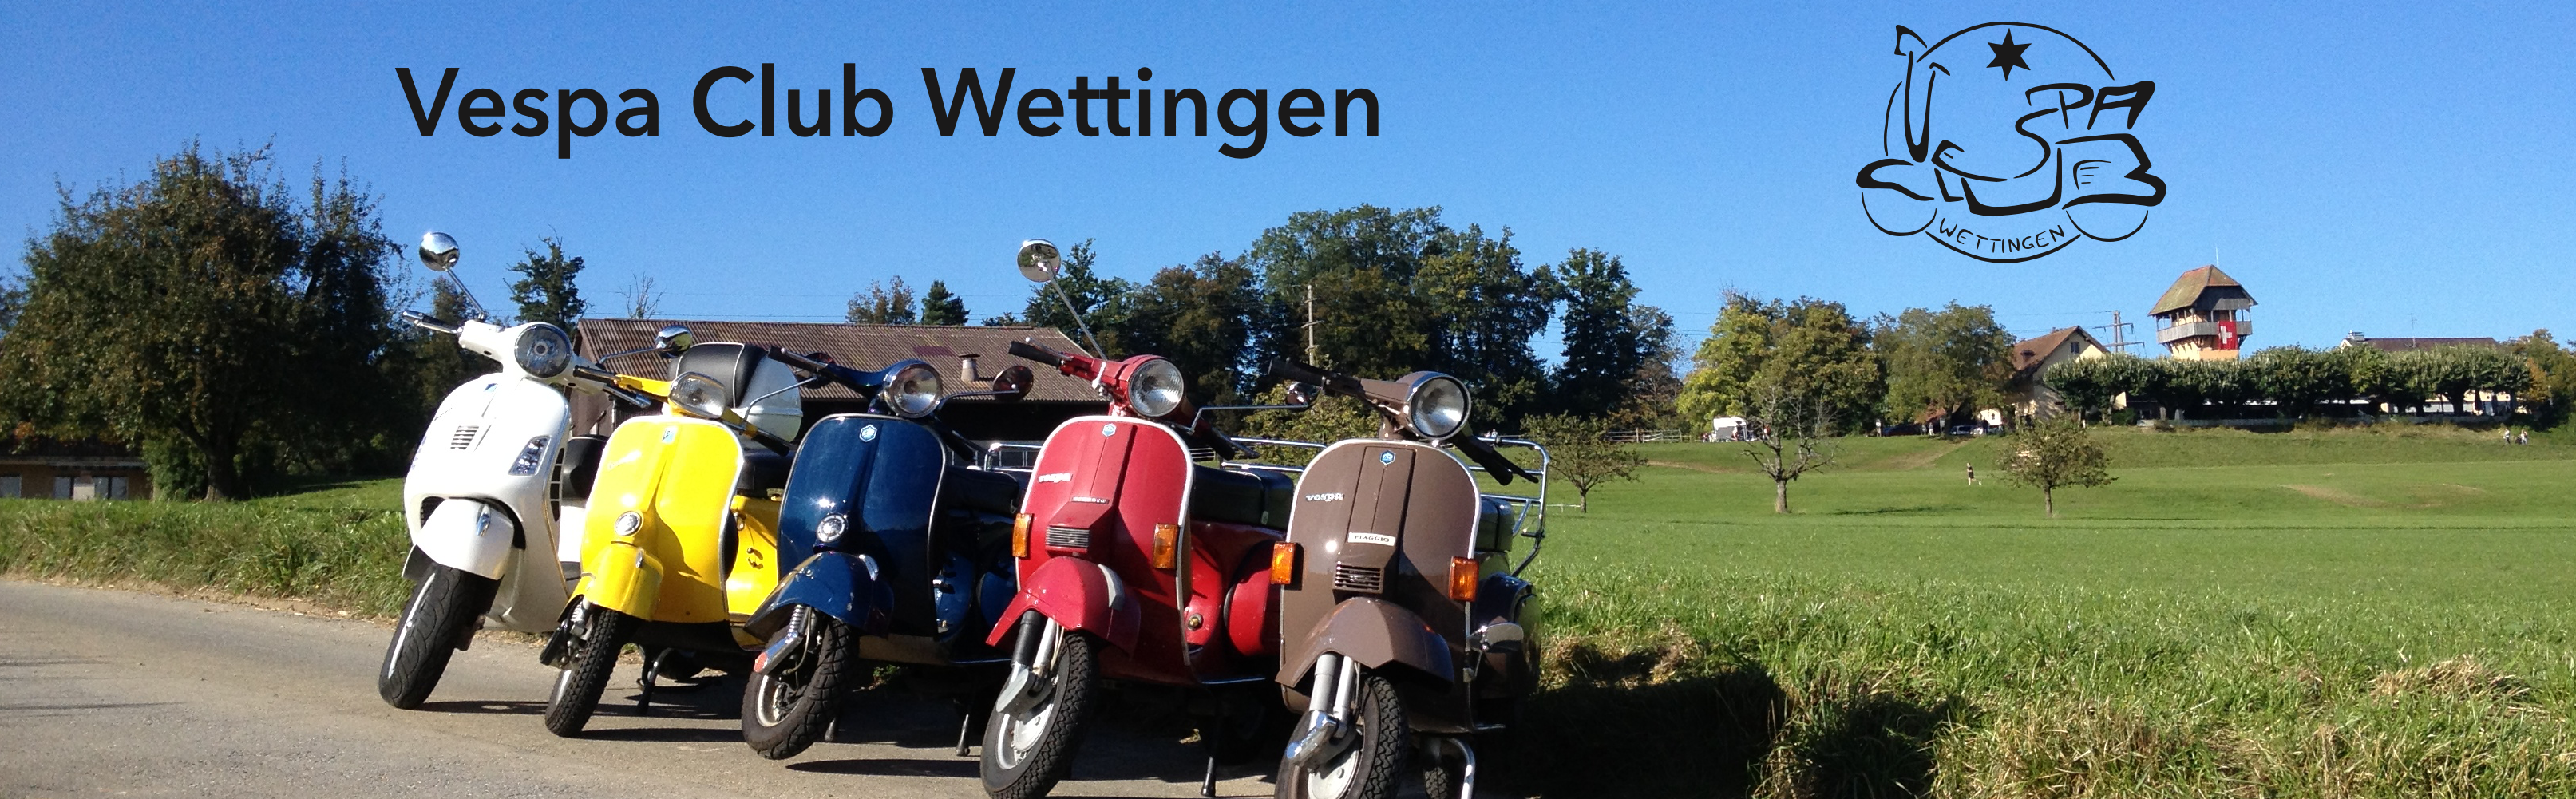 Vespa Club Wettingen